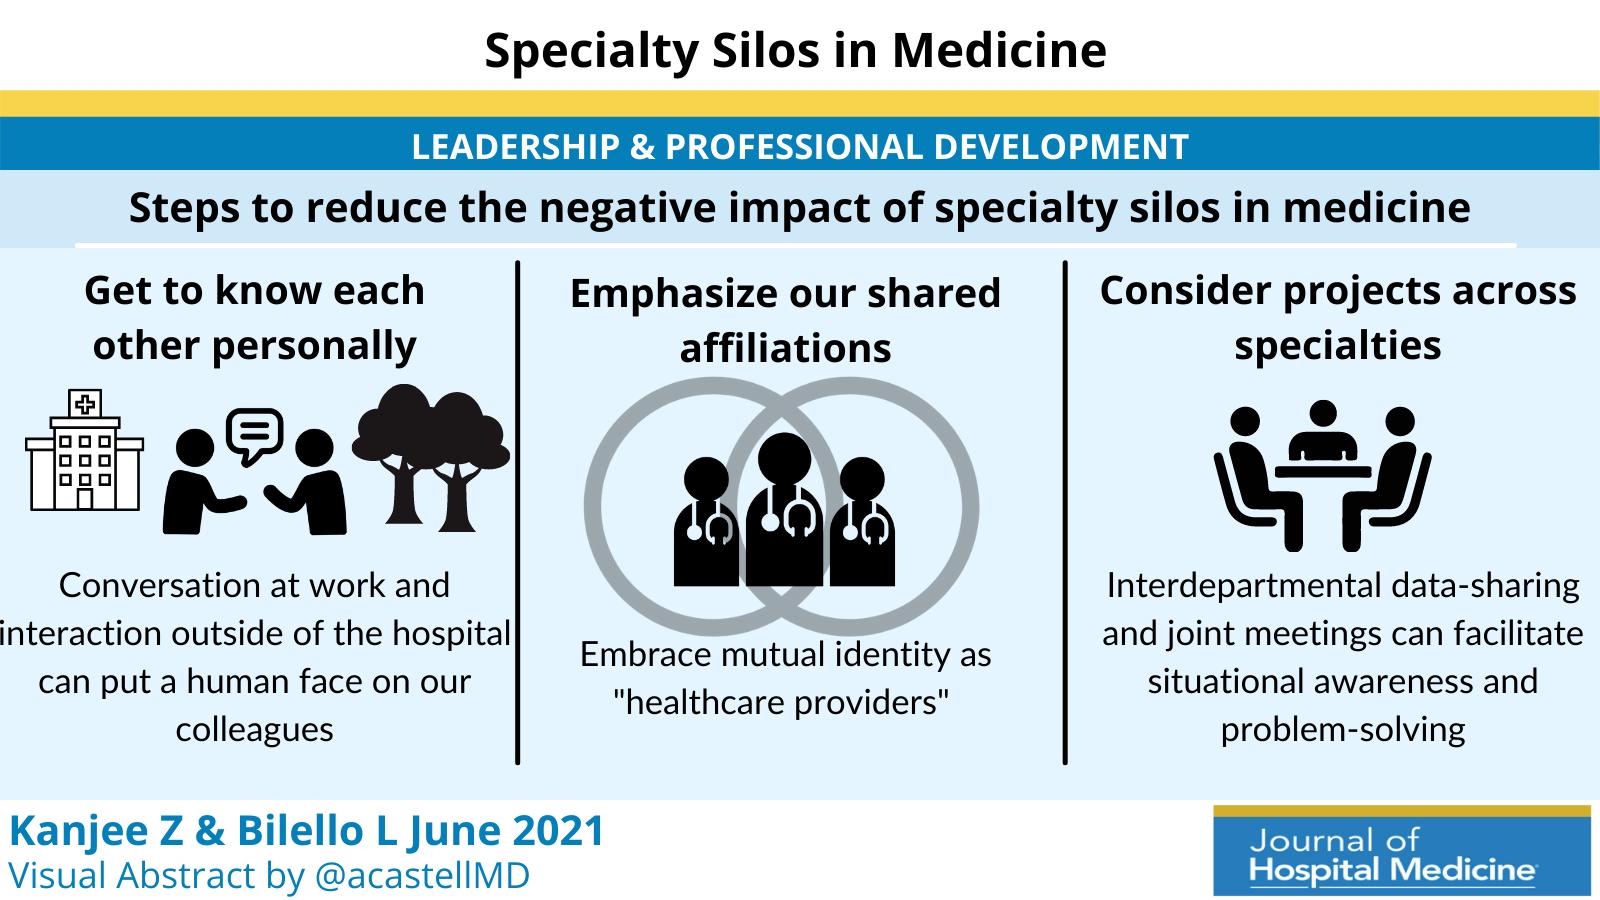 Leadership & Professional Development: Specialty Silos in Medicine